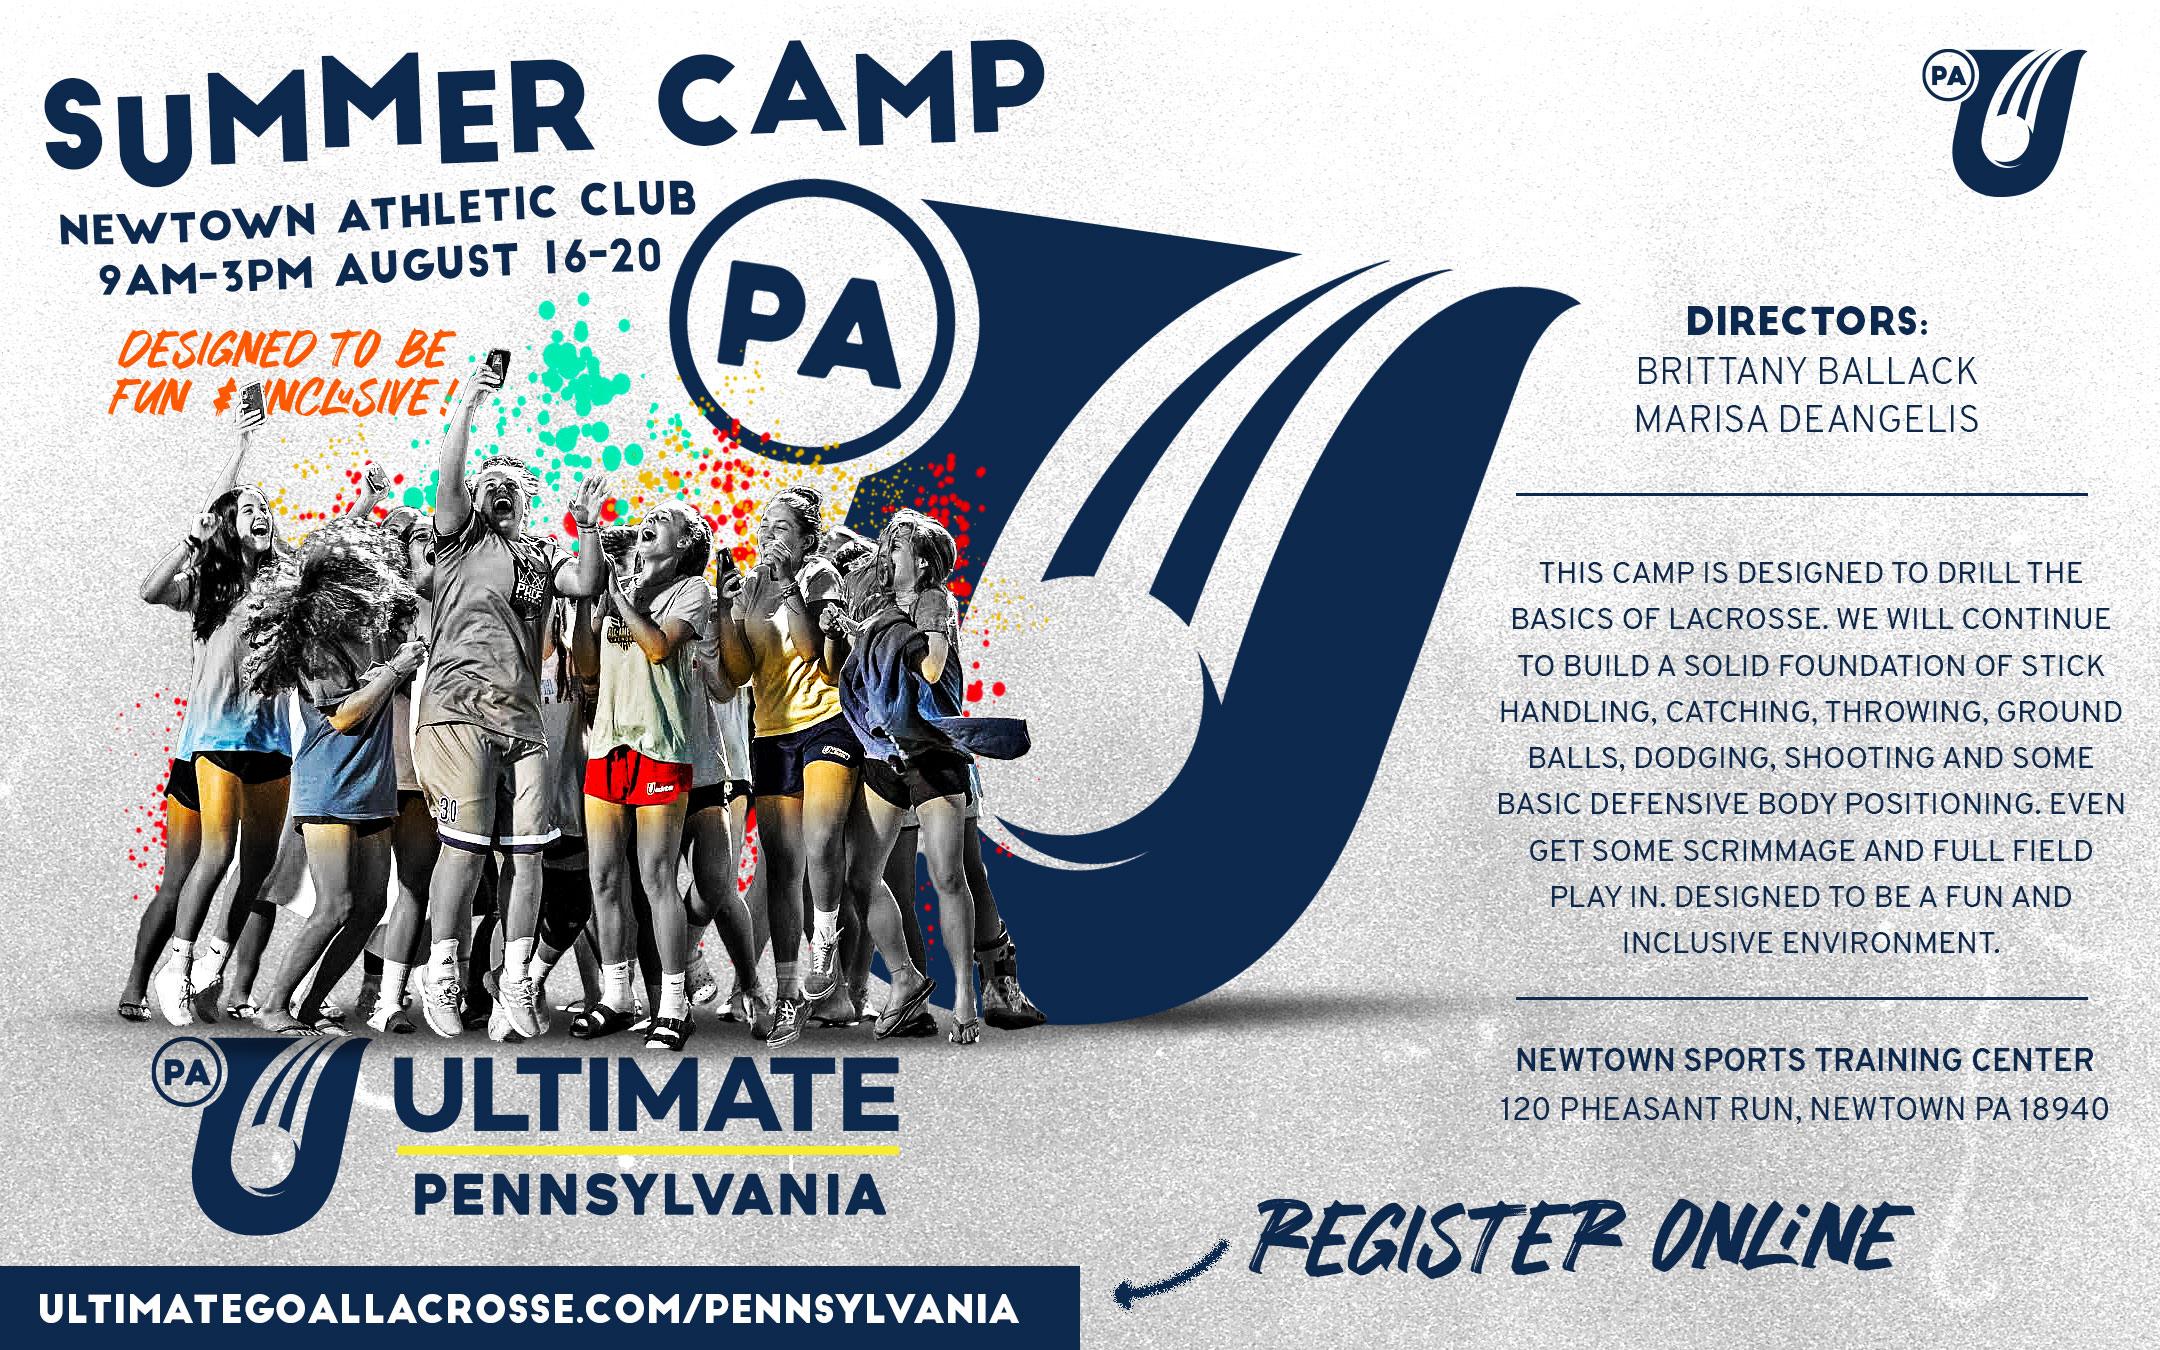 Ultimate-PA-Summercamp